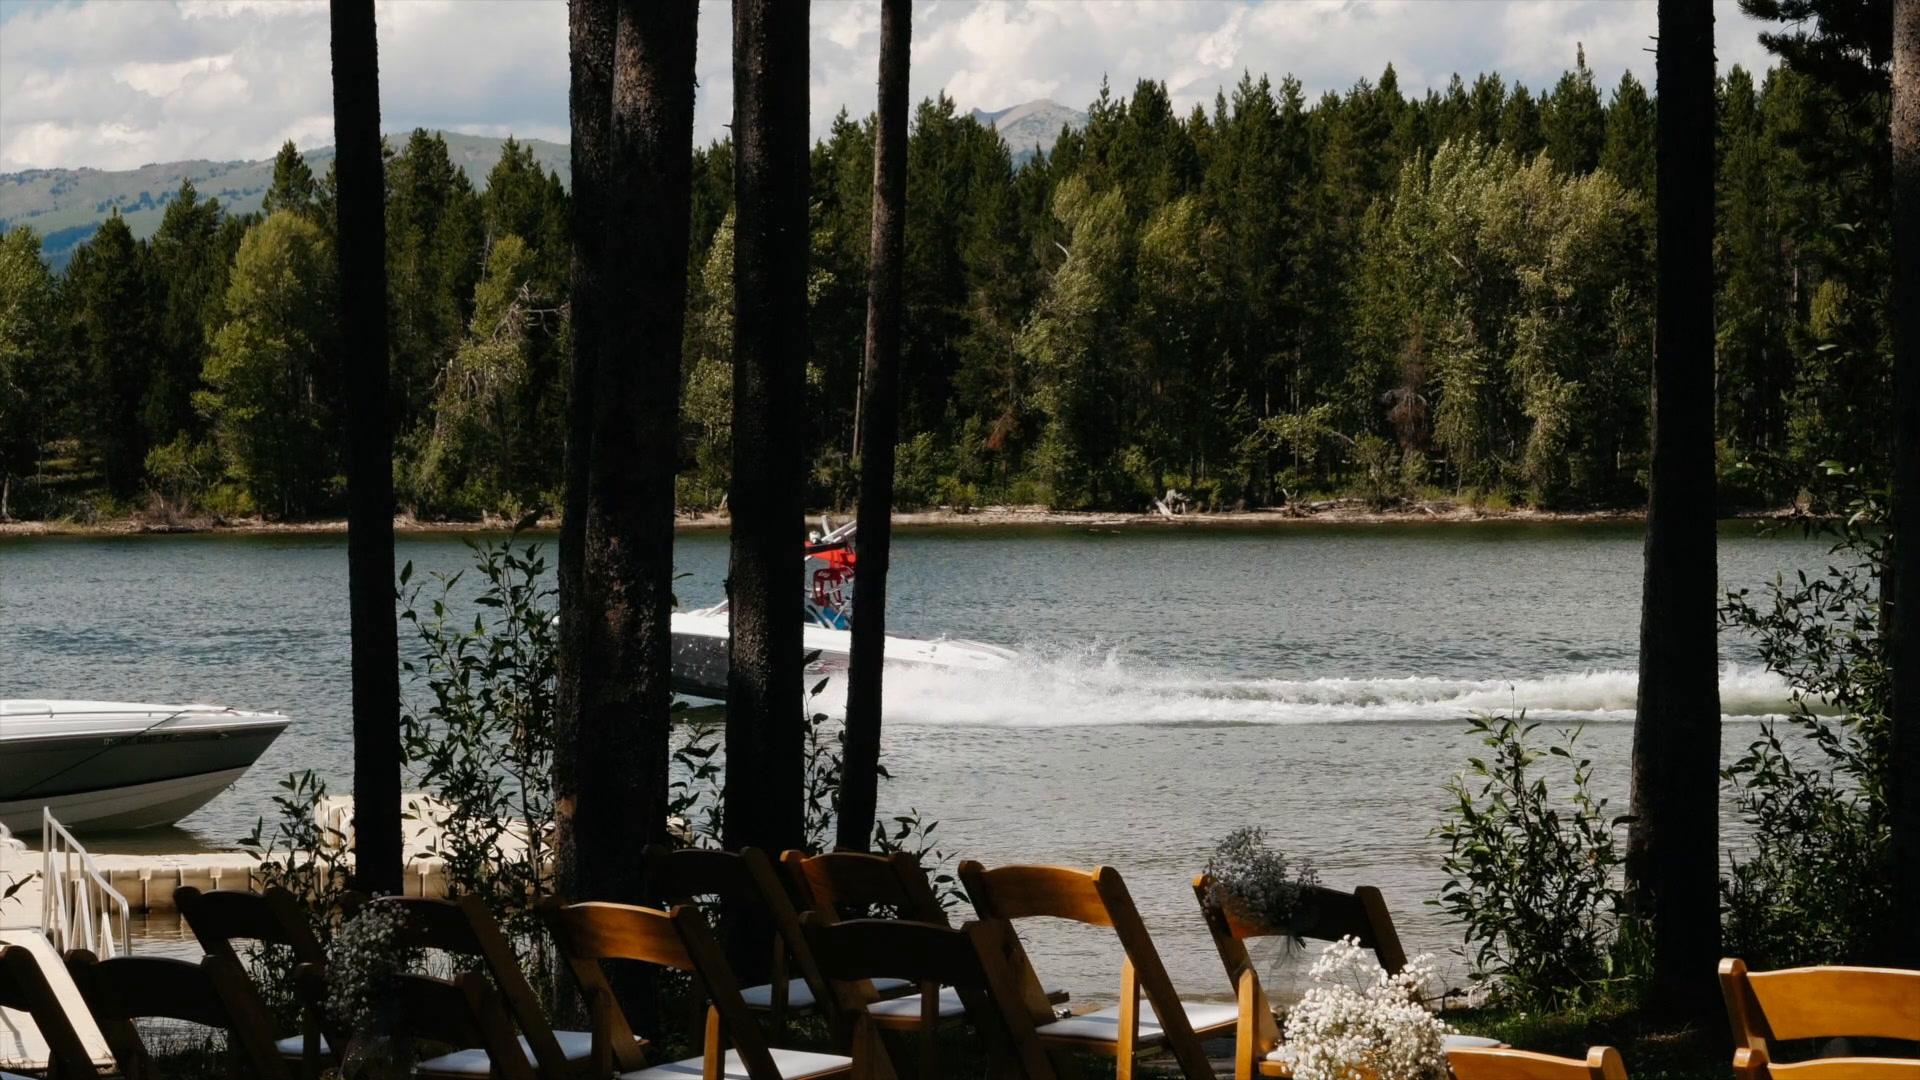 Abby + Preston | Island Park, Idaho | Island Park